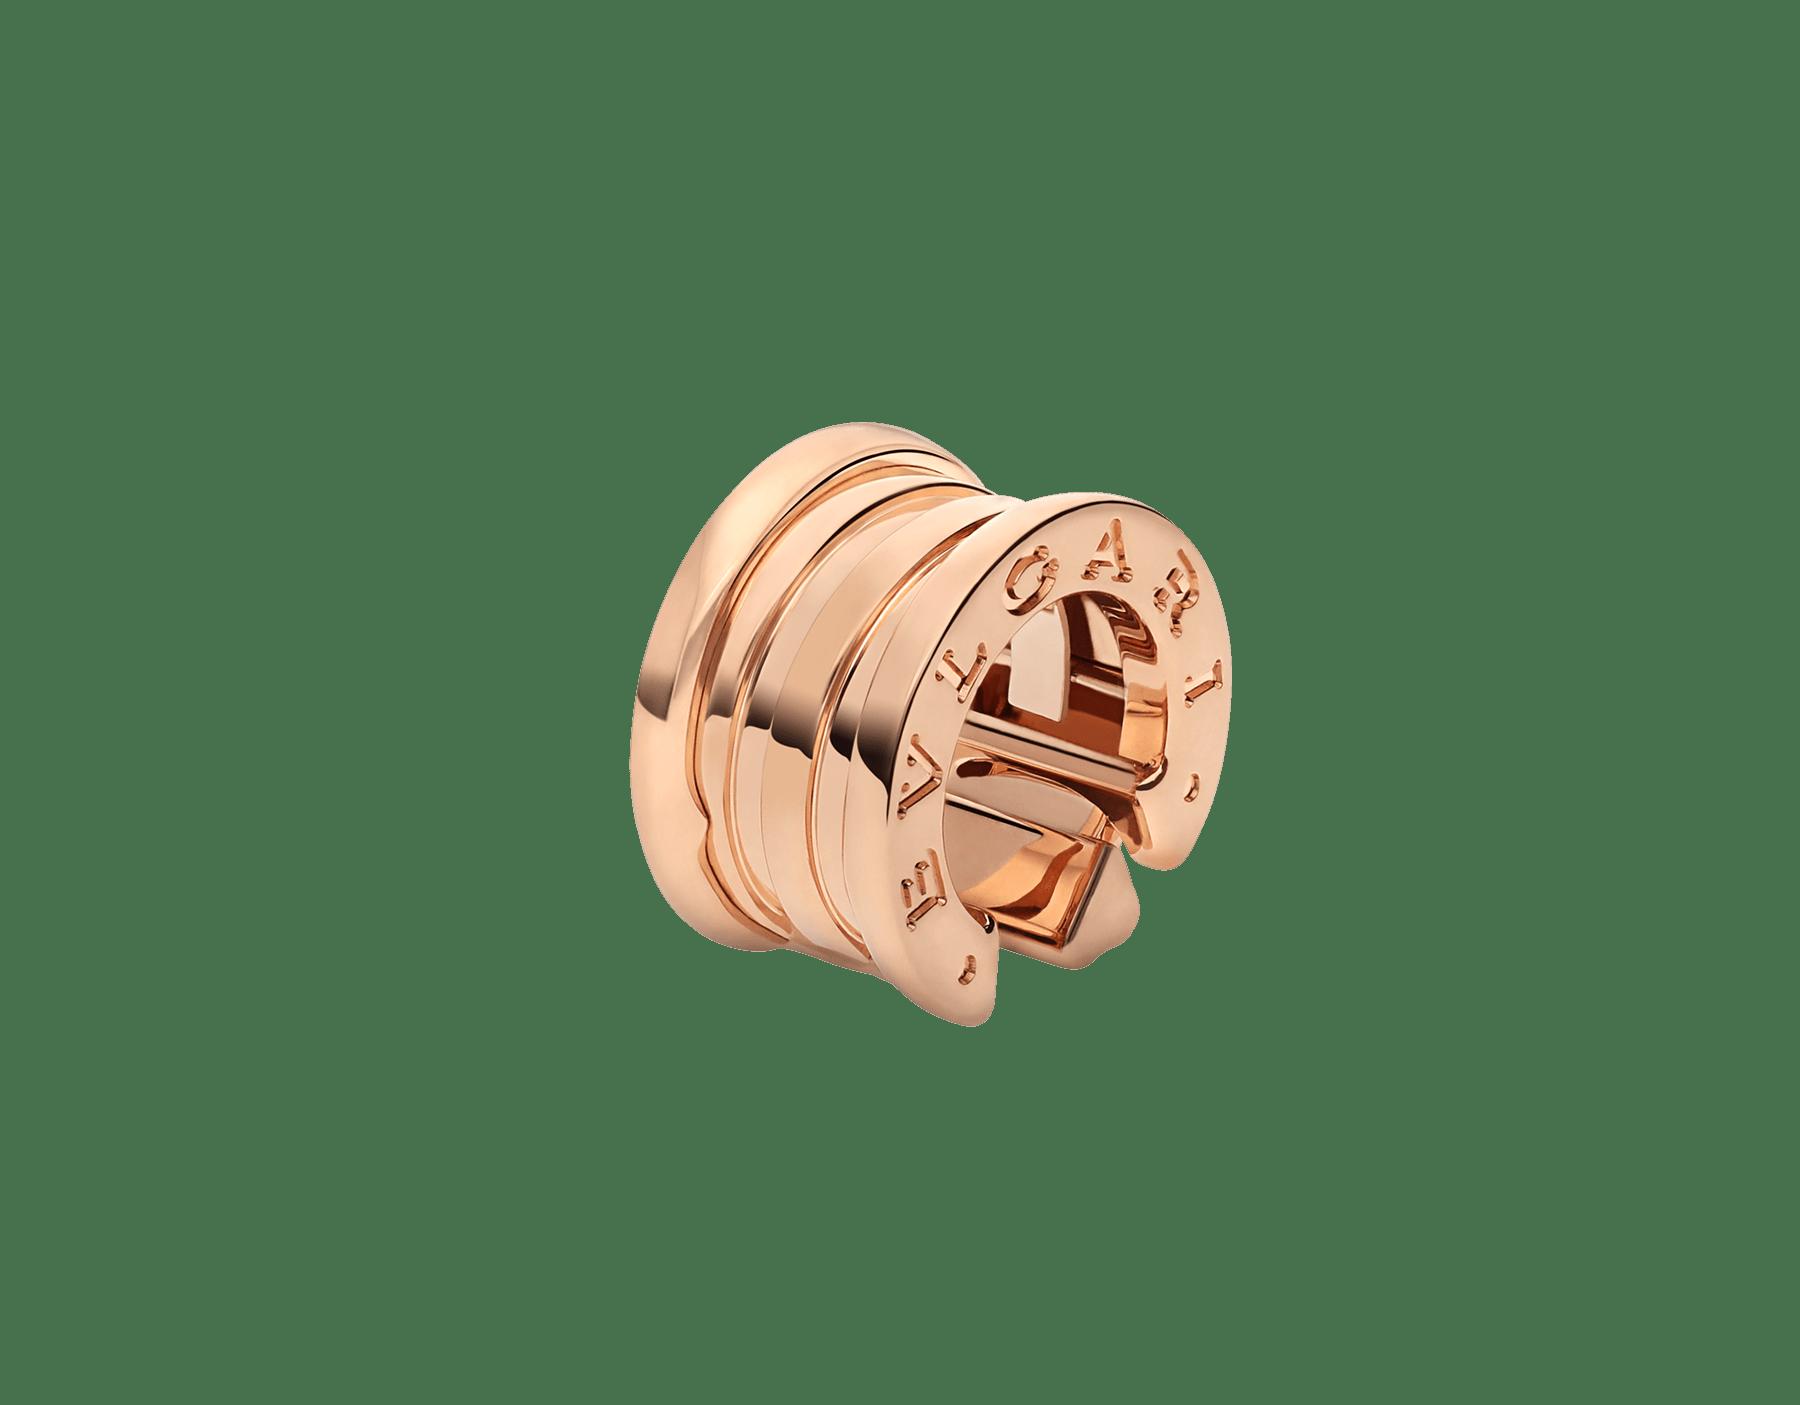 B.zero1 single ear cuff in 18kt rose gold 356163 image 1